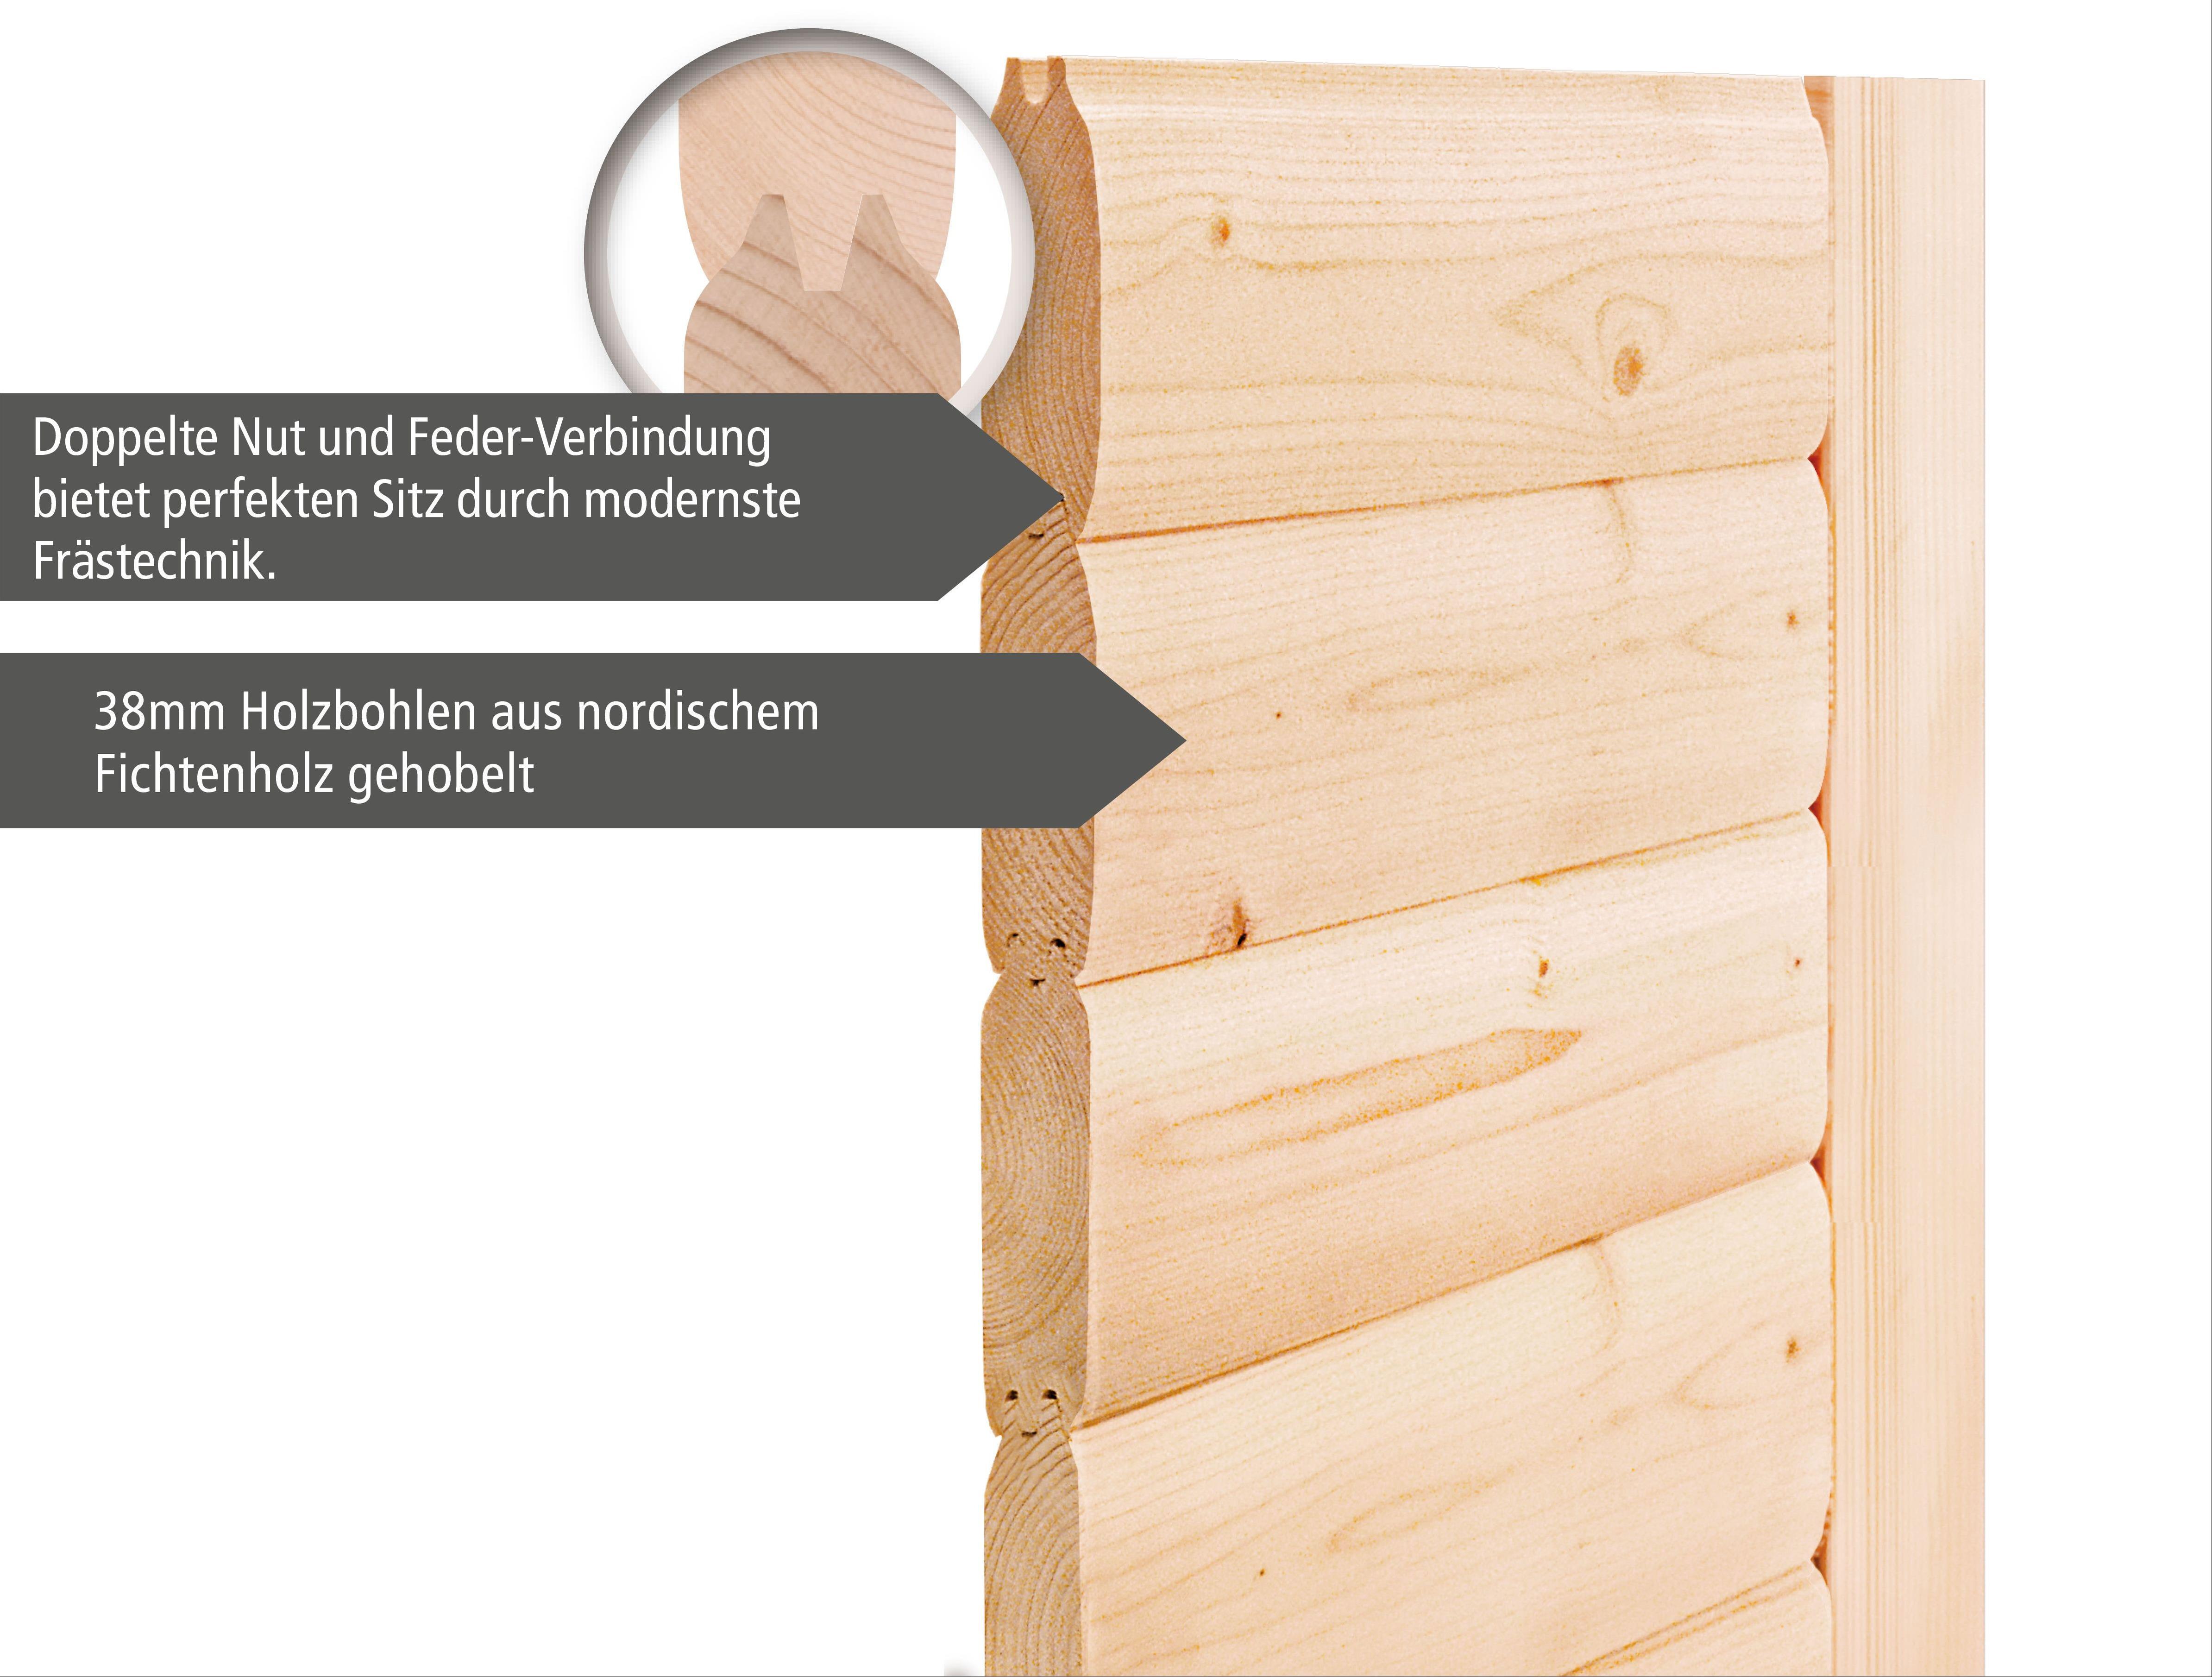 WoodFeeling Sauna Svea 38mm mit Bio Saunaofen 9 kW extern Klarglas Tür Bild 5